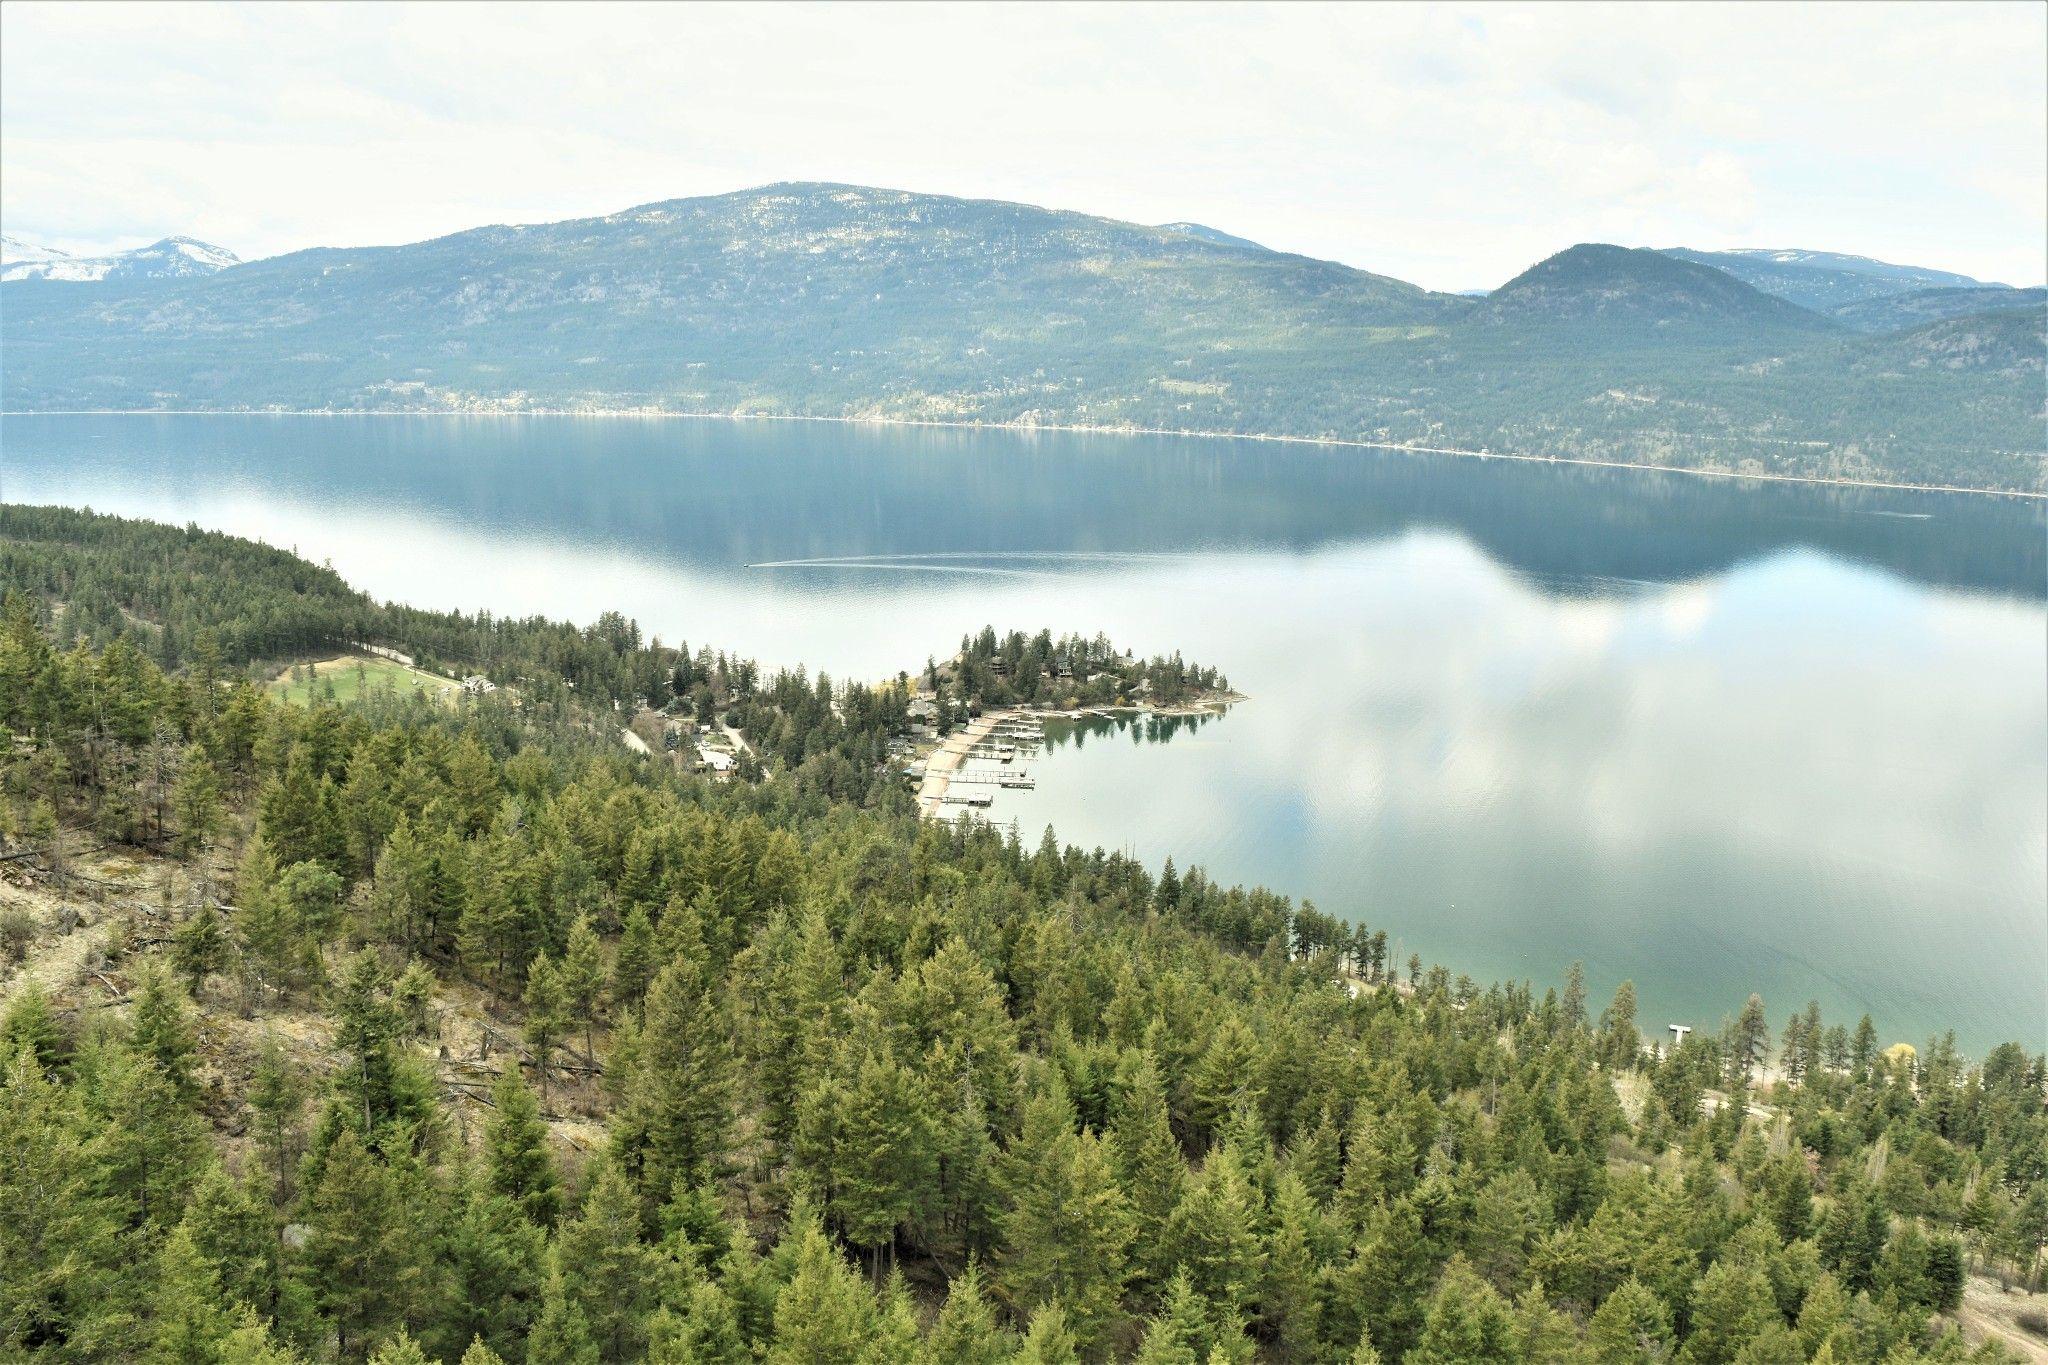 Main Photo: * Eastside Road in Vernon: Okanagan Landing Vacant Land for sale (North Okanagan)  : MLS®# 10202745